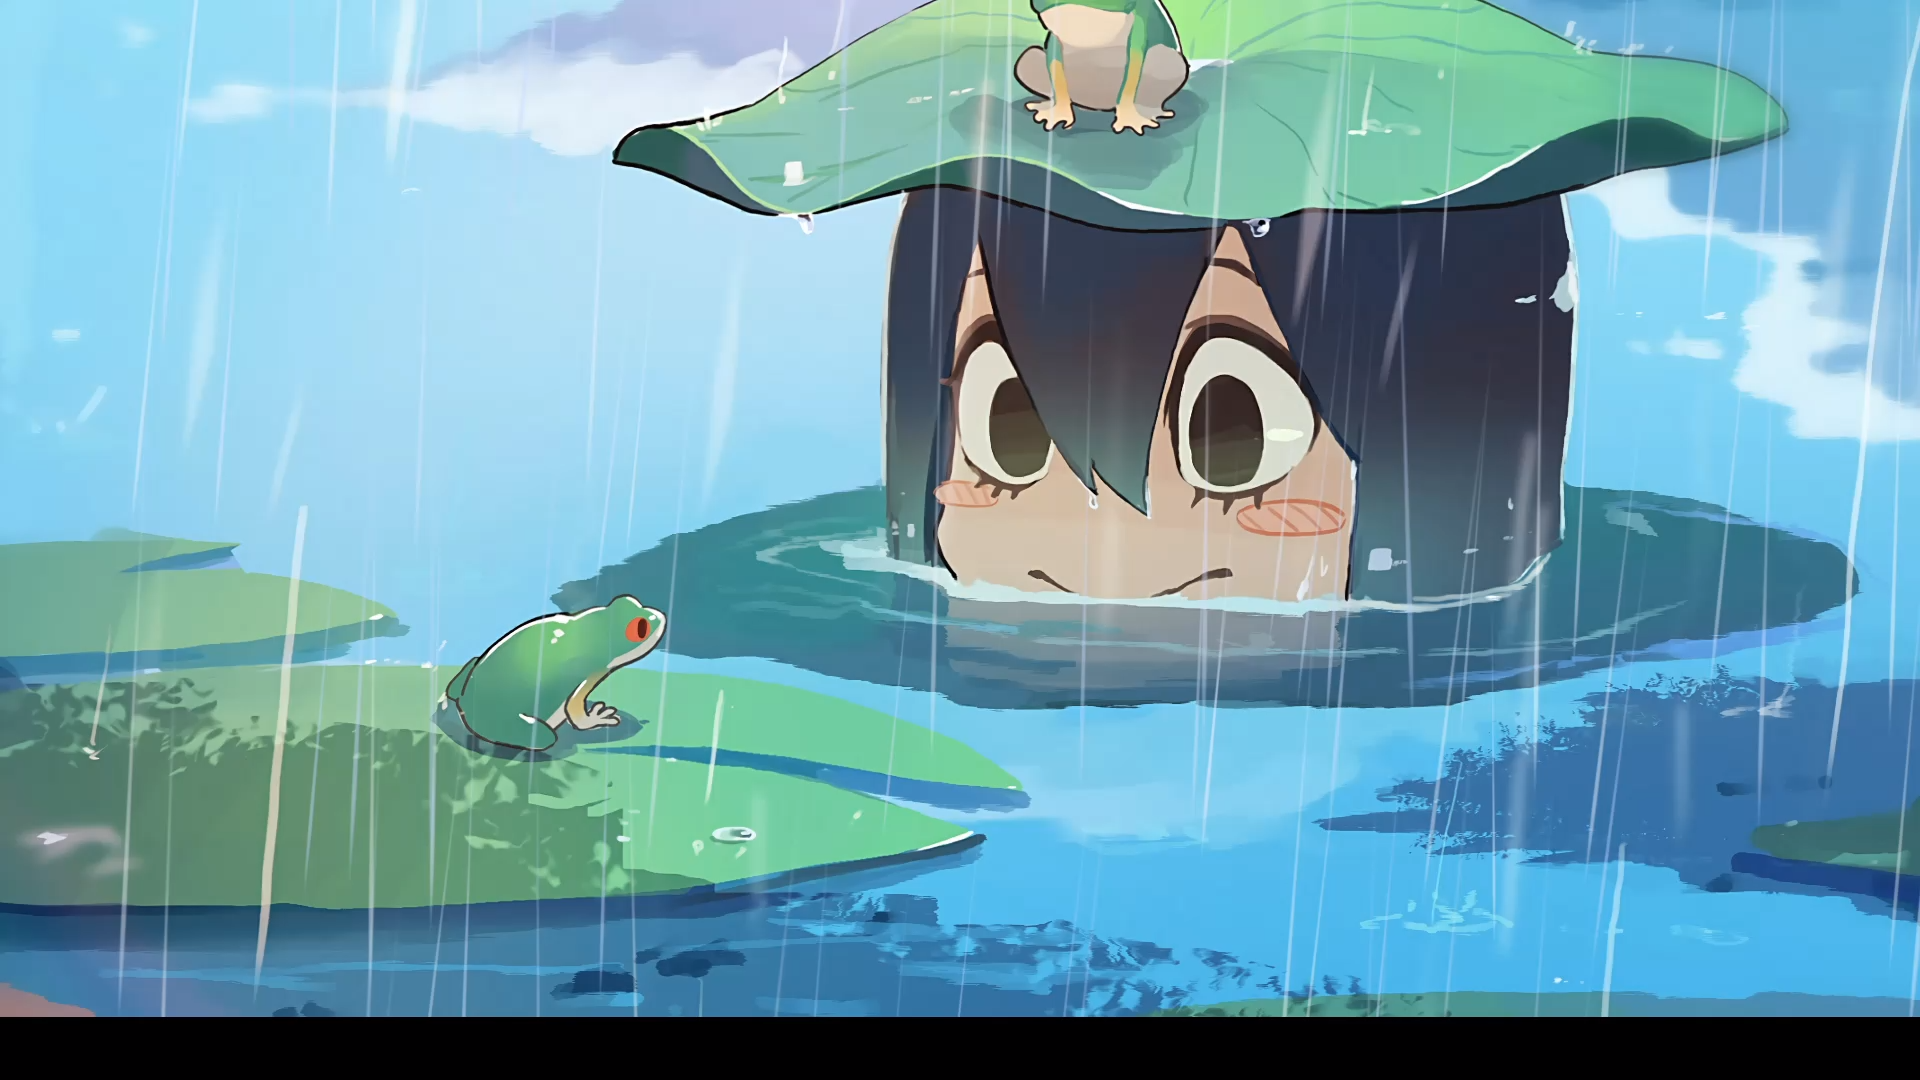 Froppy My Hero Academia Boku No Hero Academia Anime Wallpaper Video In 2020 Anime Wallpaper Live Anime Computer Wallpaper Cute Anime Wallpaper